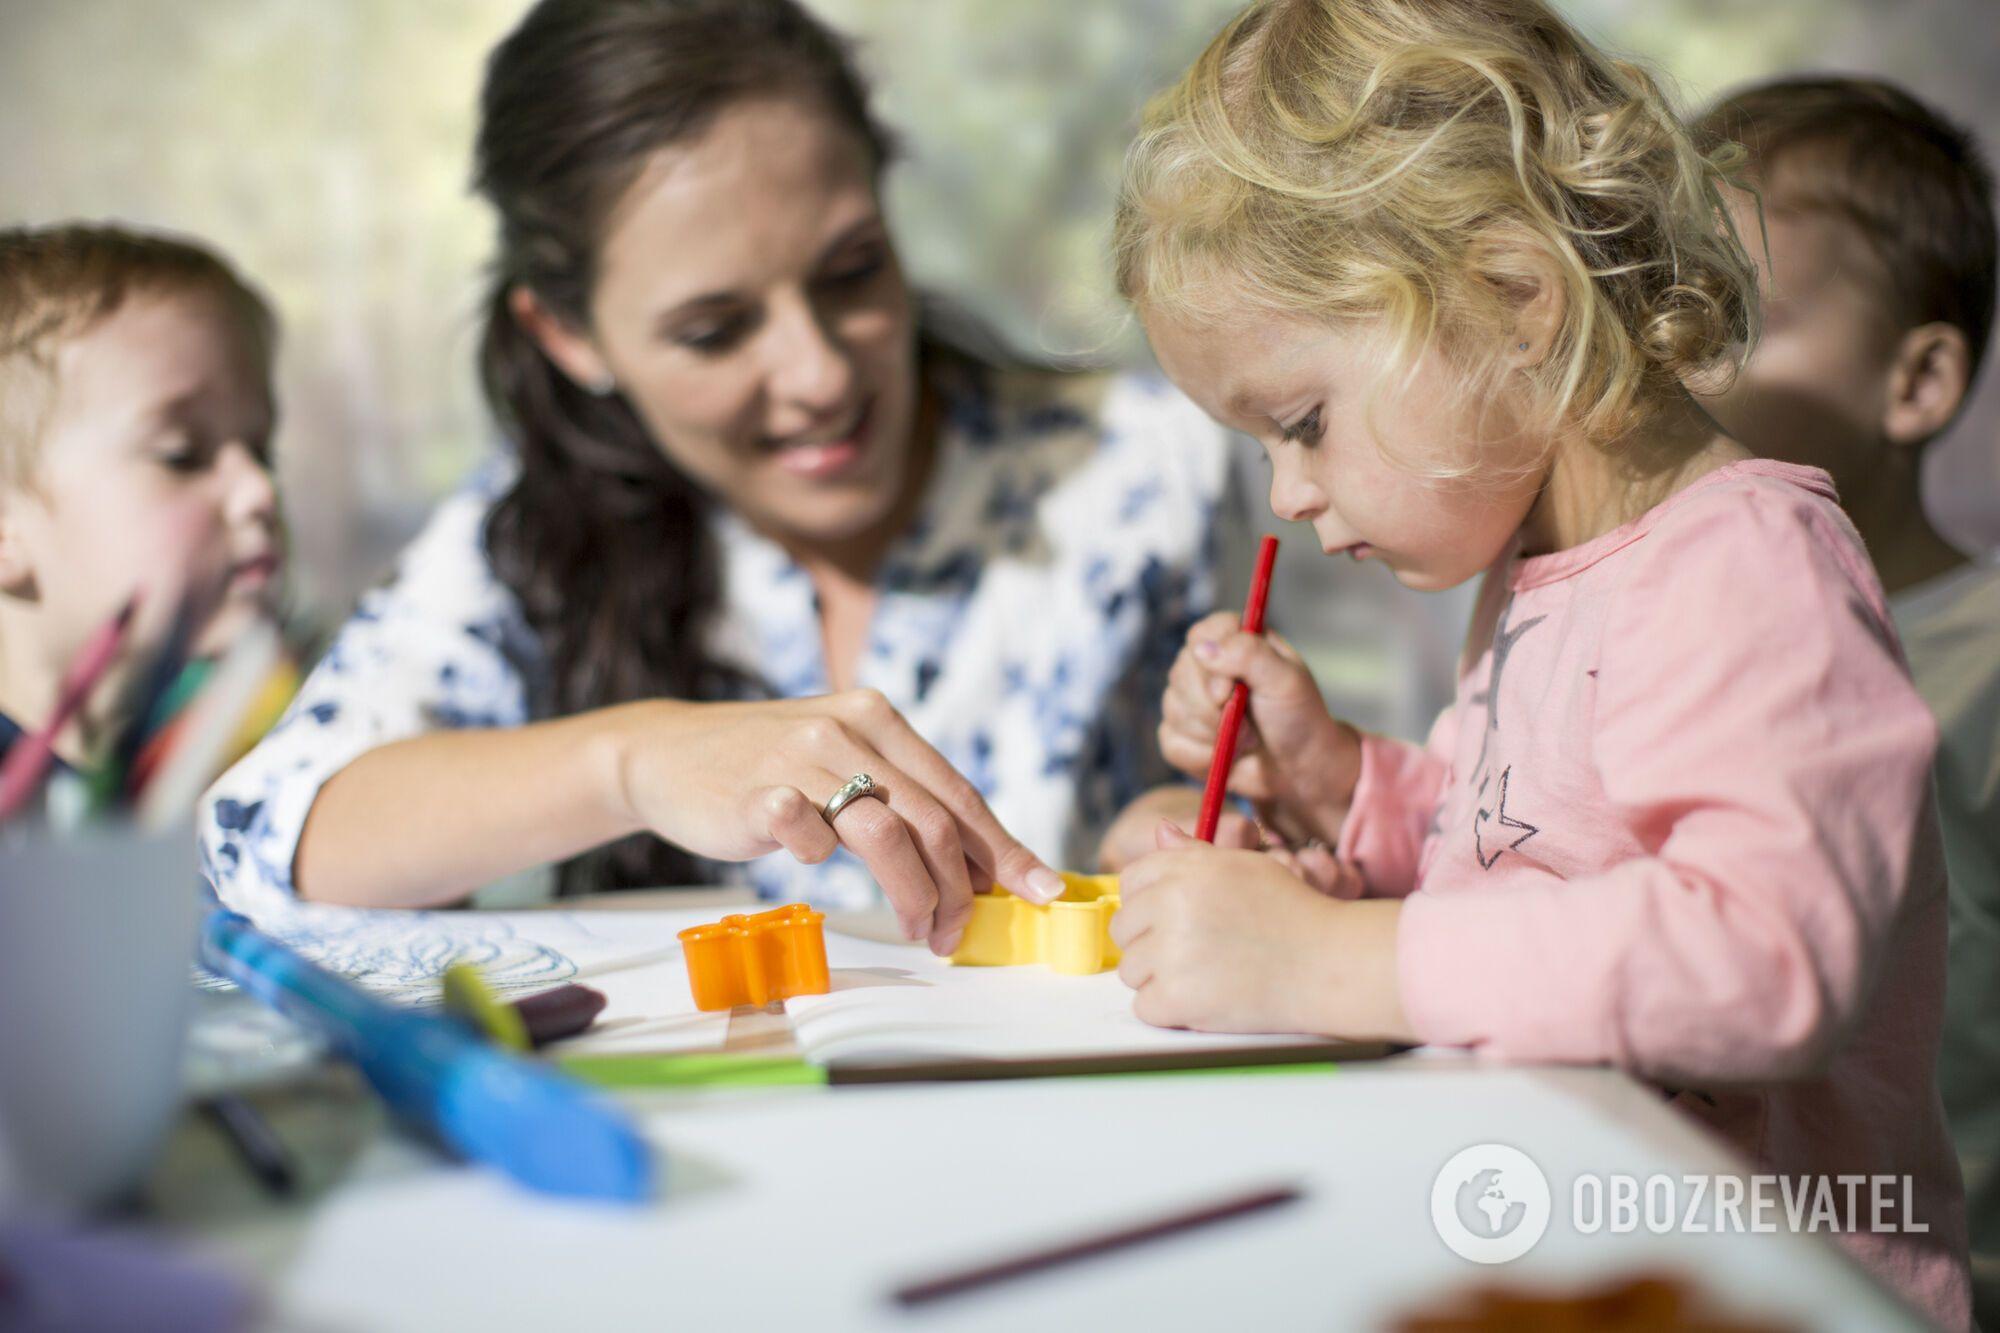 Вірус у дитсадок може занести й вихователь